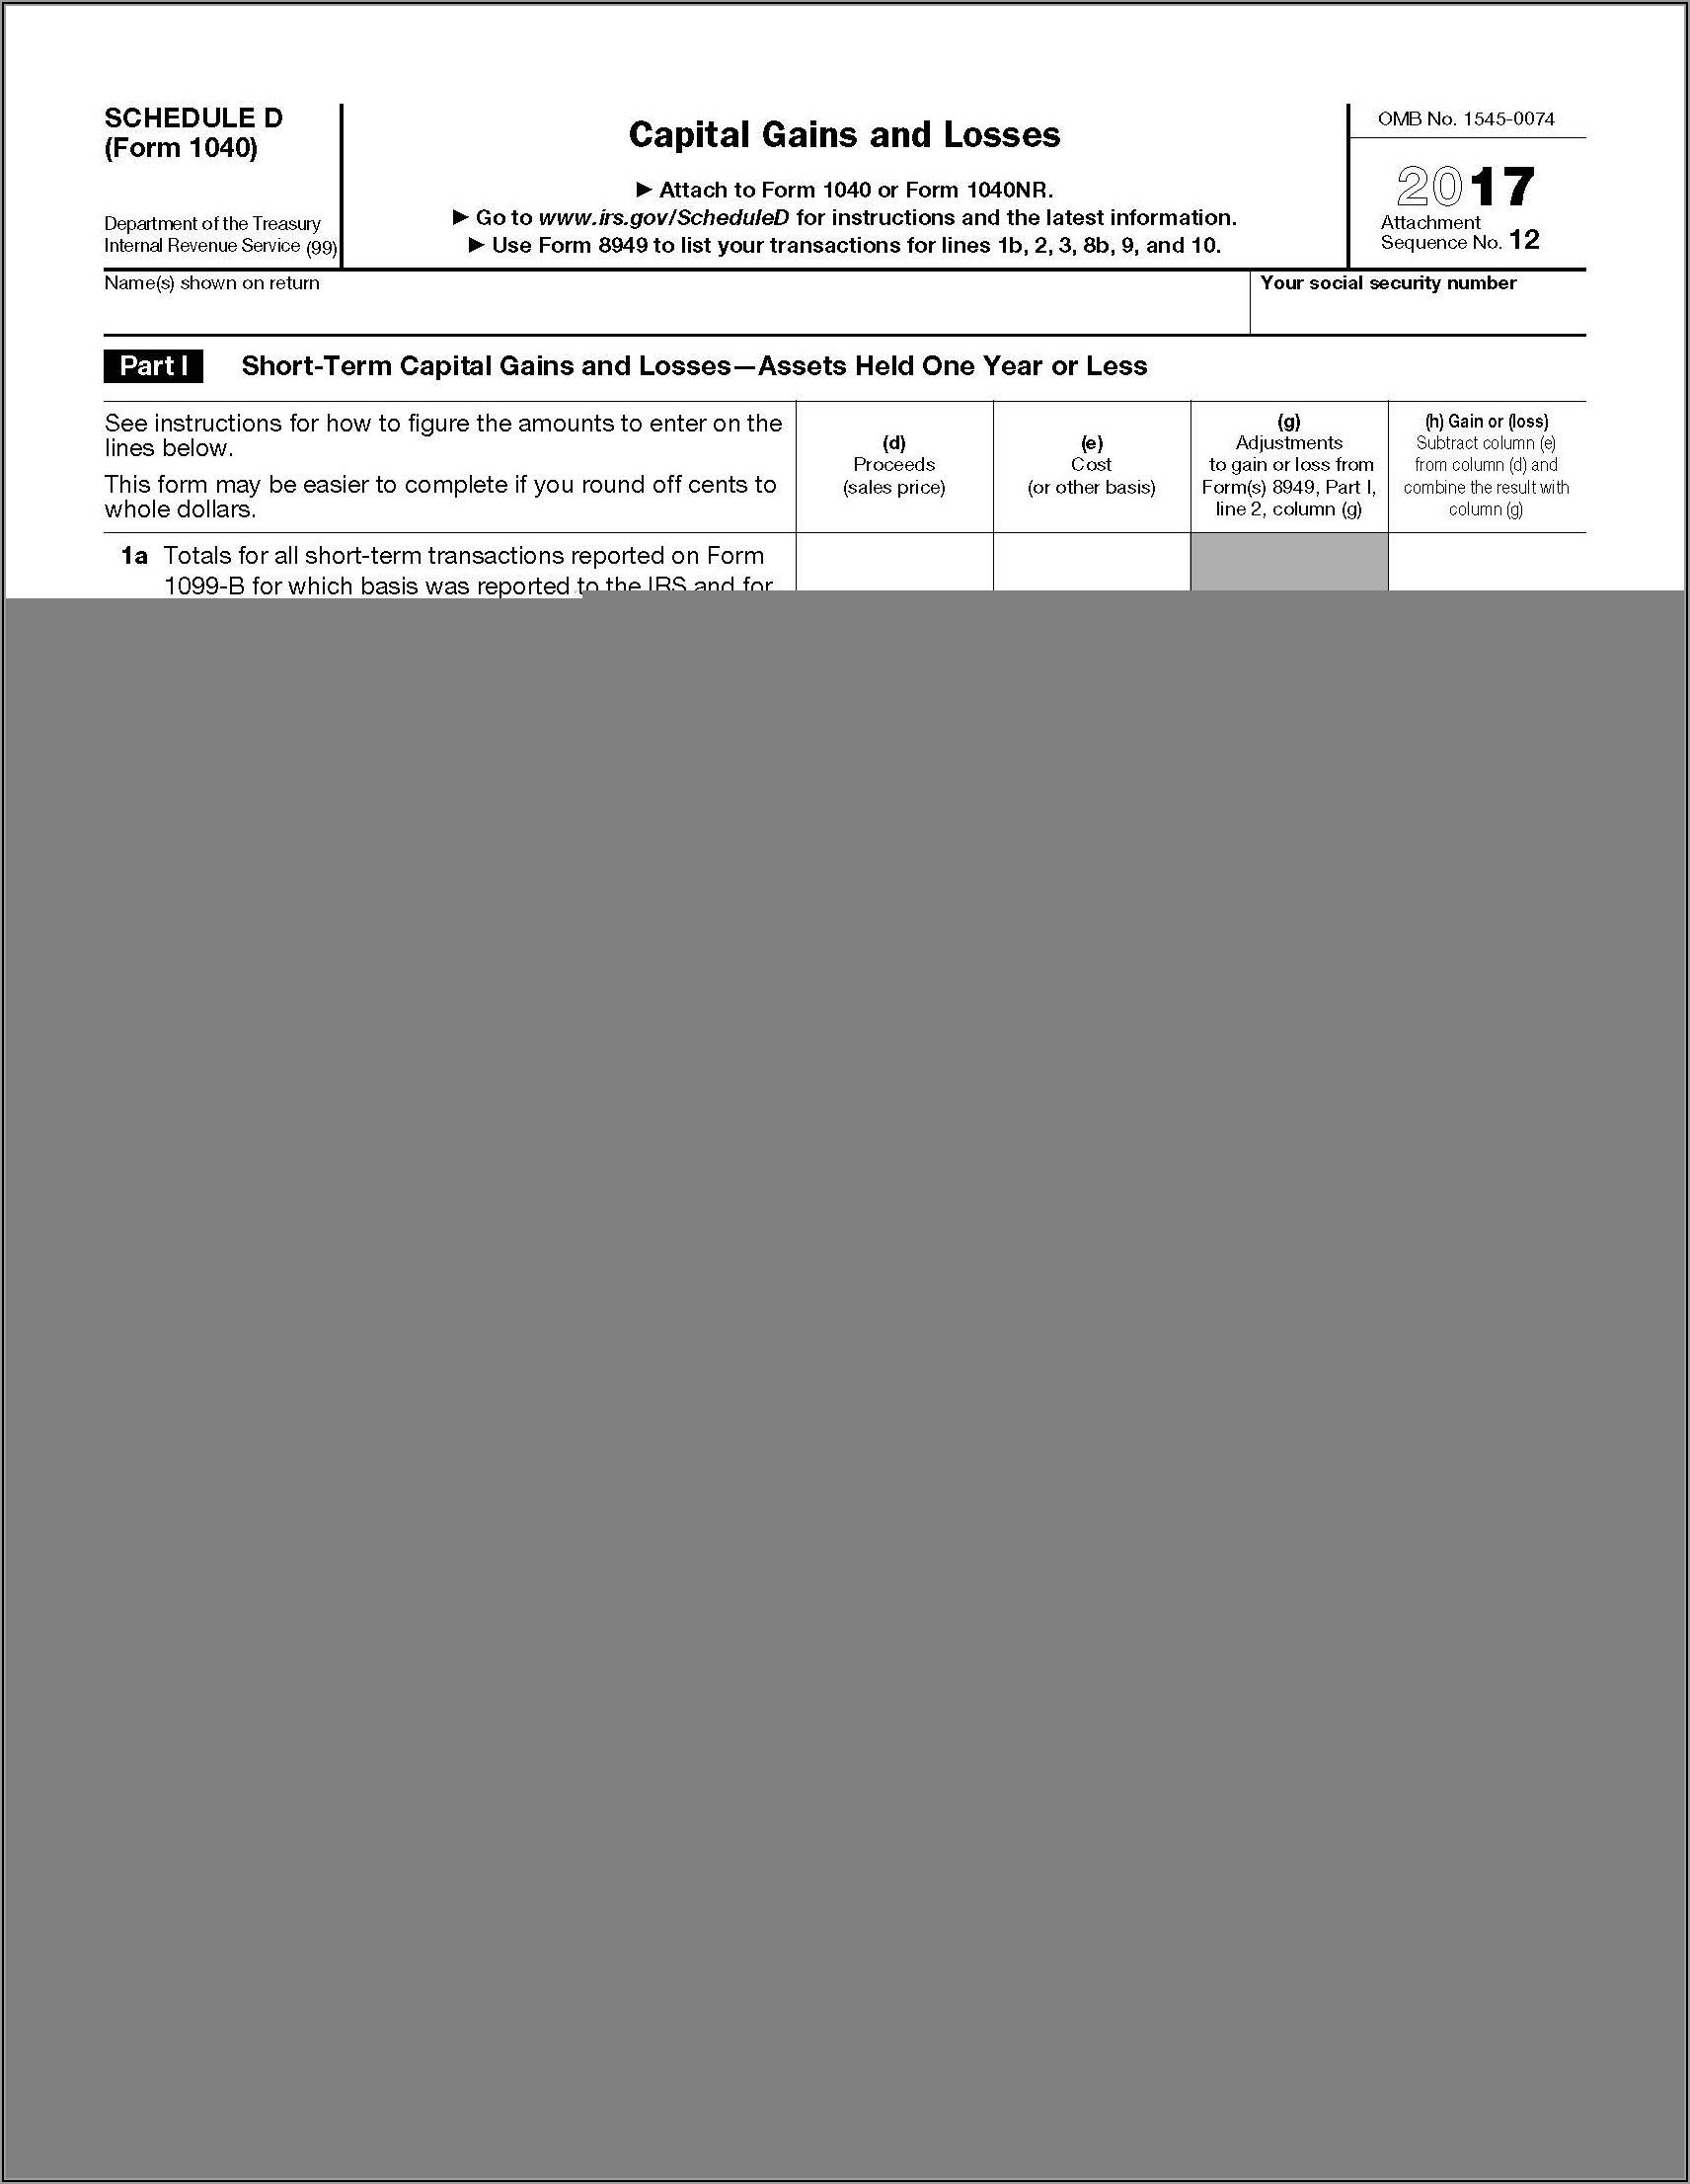 Schedule D Tax Worksheet Instructions